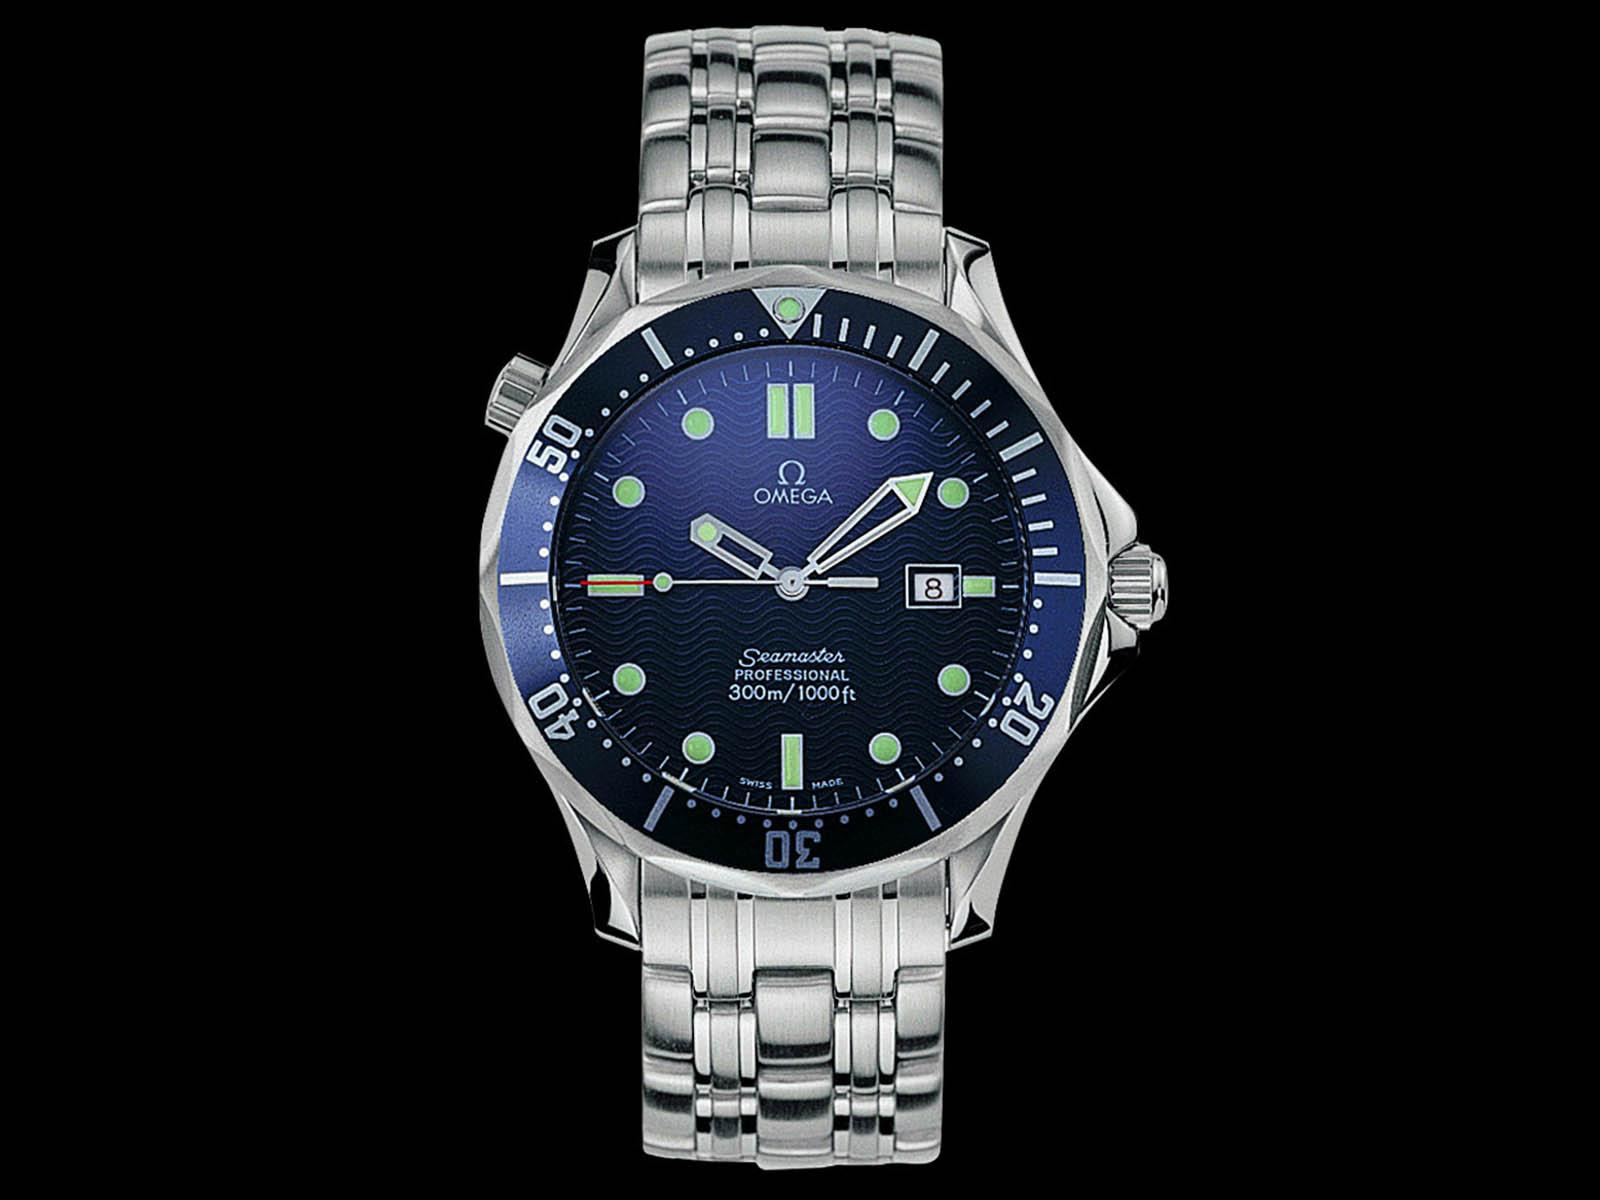 omega-seamaster-300m-quartz-professional-goldeneye.jpg